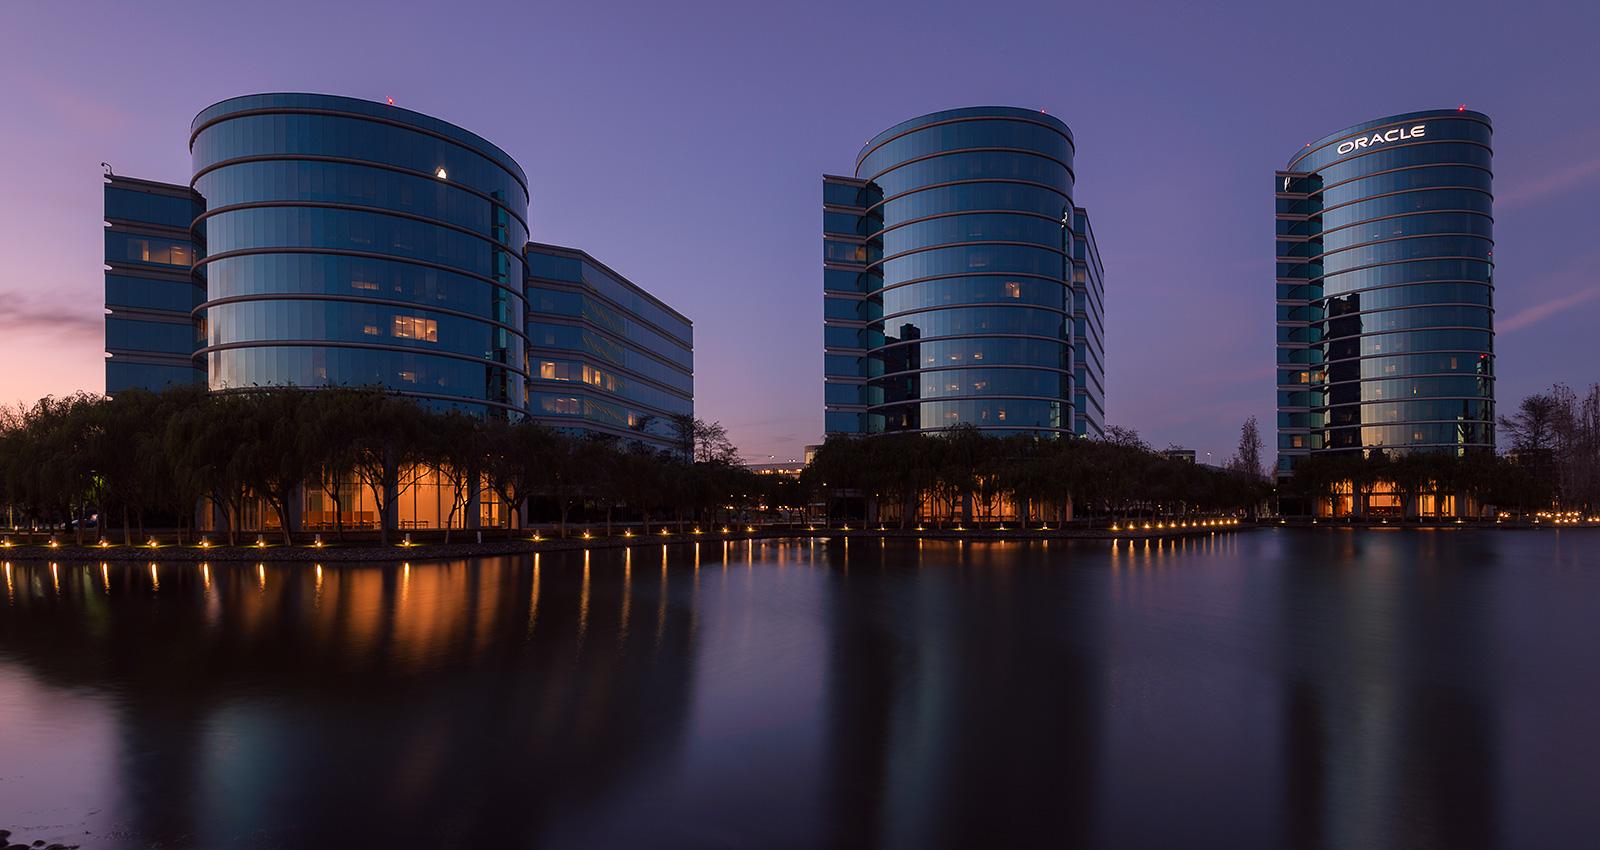 Oracle Corporation Campus